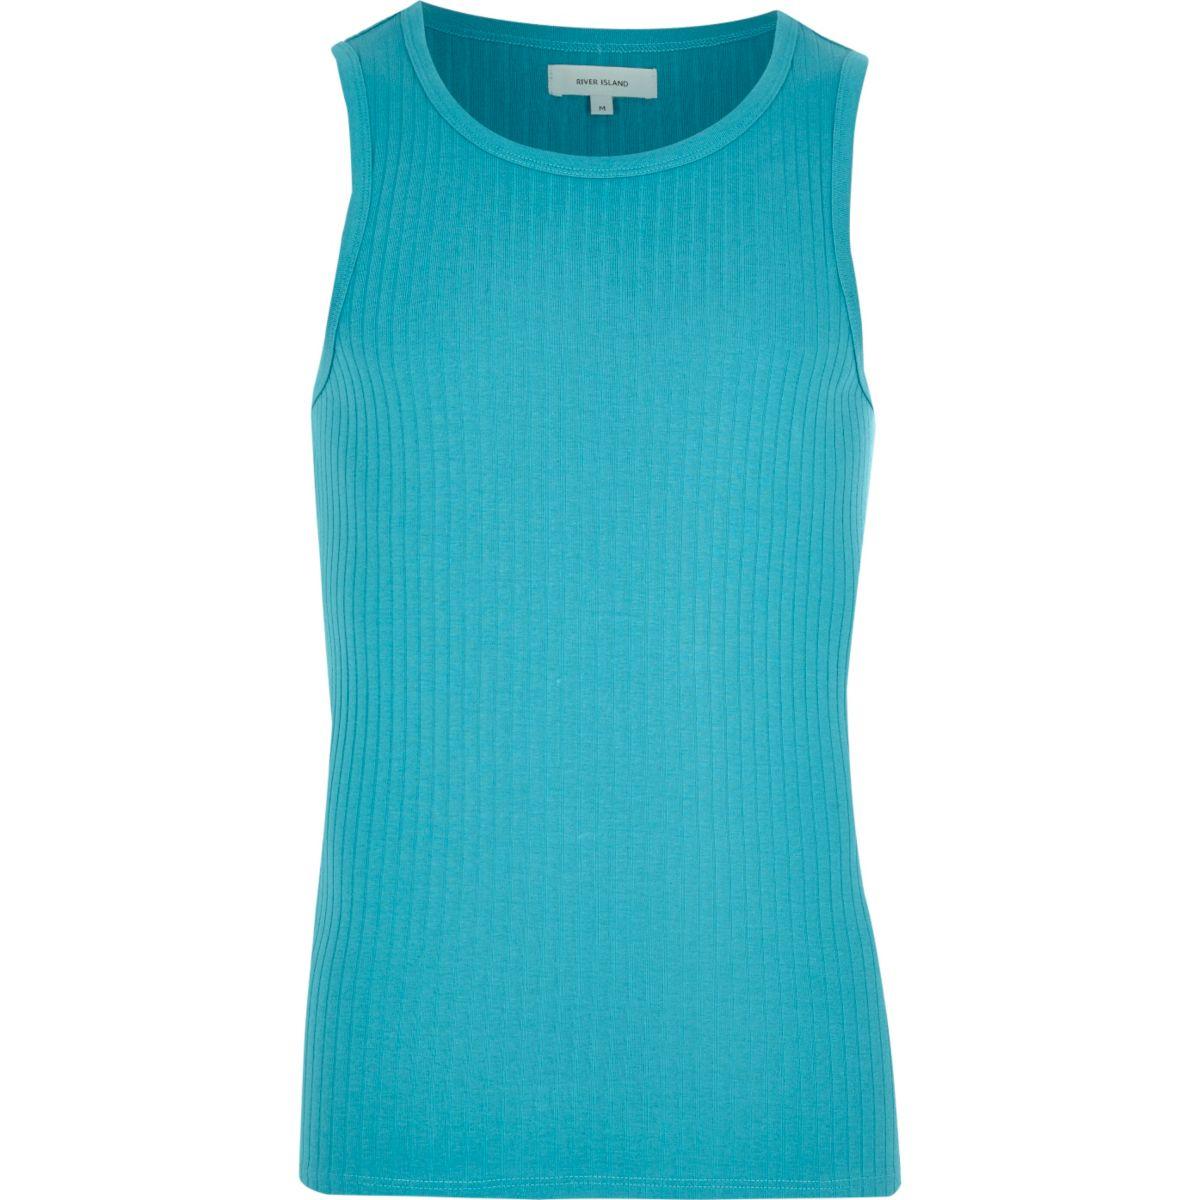 Blauw geribbeld hemdje